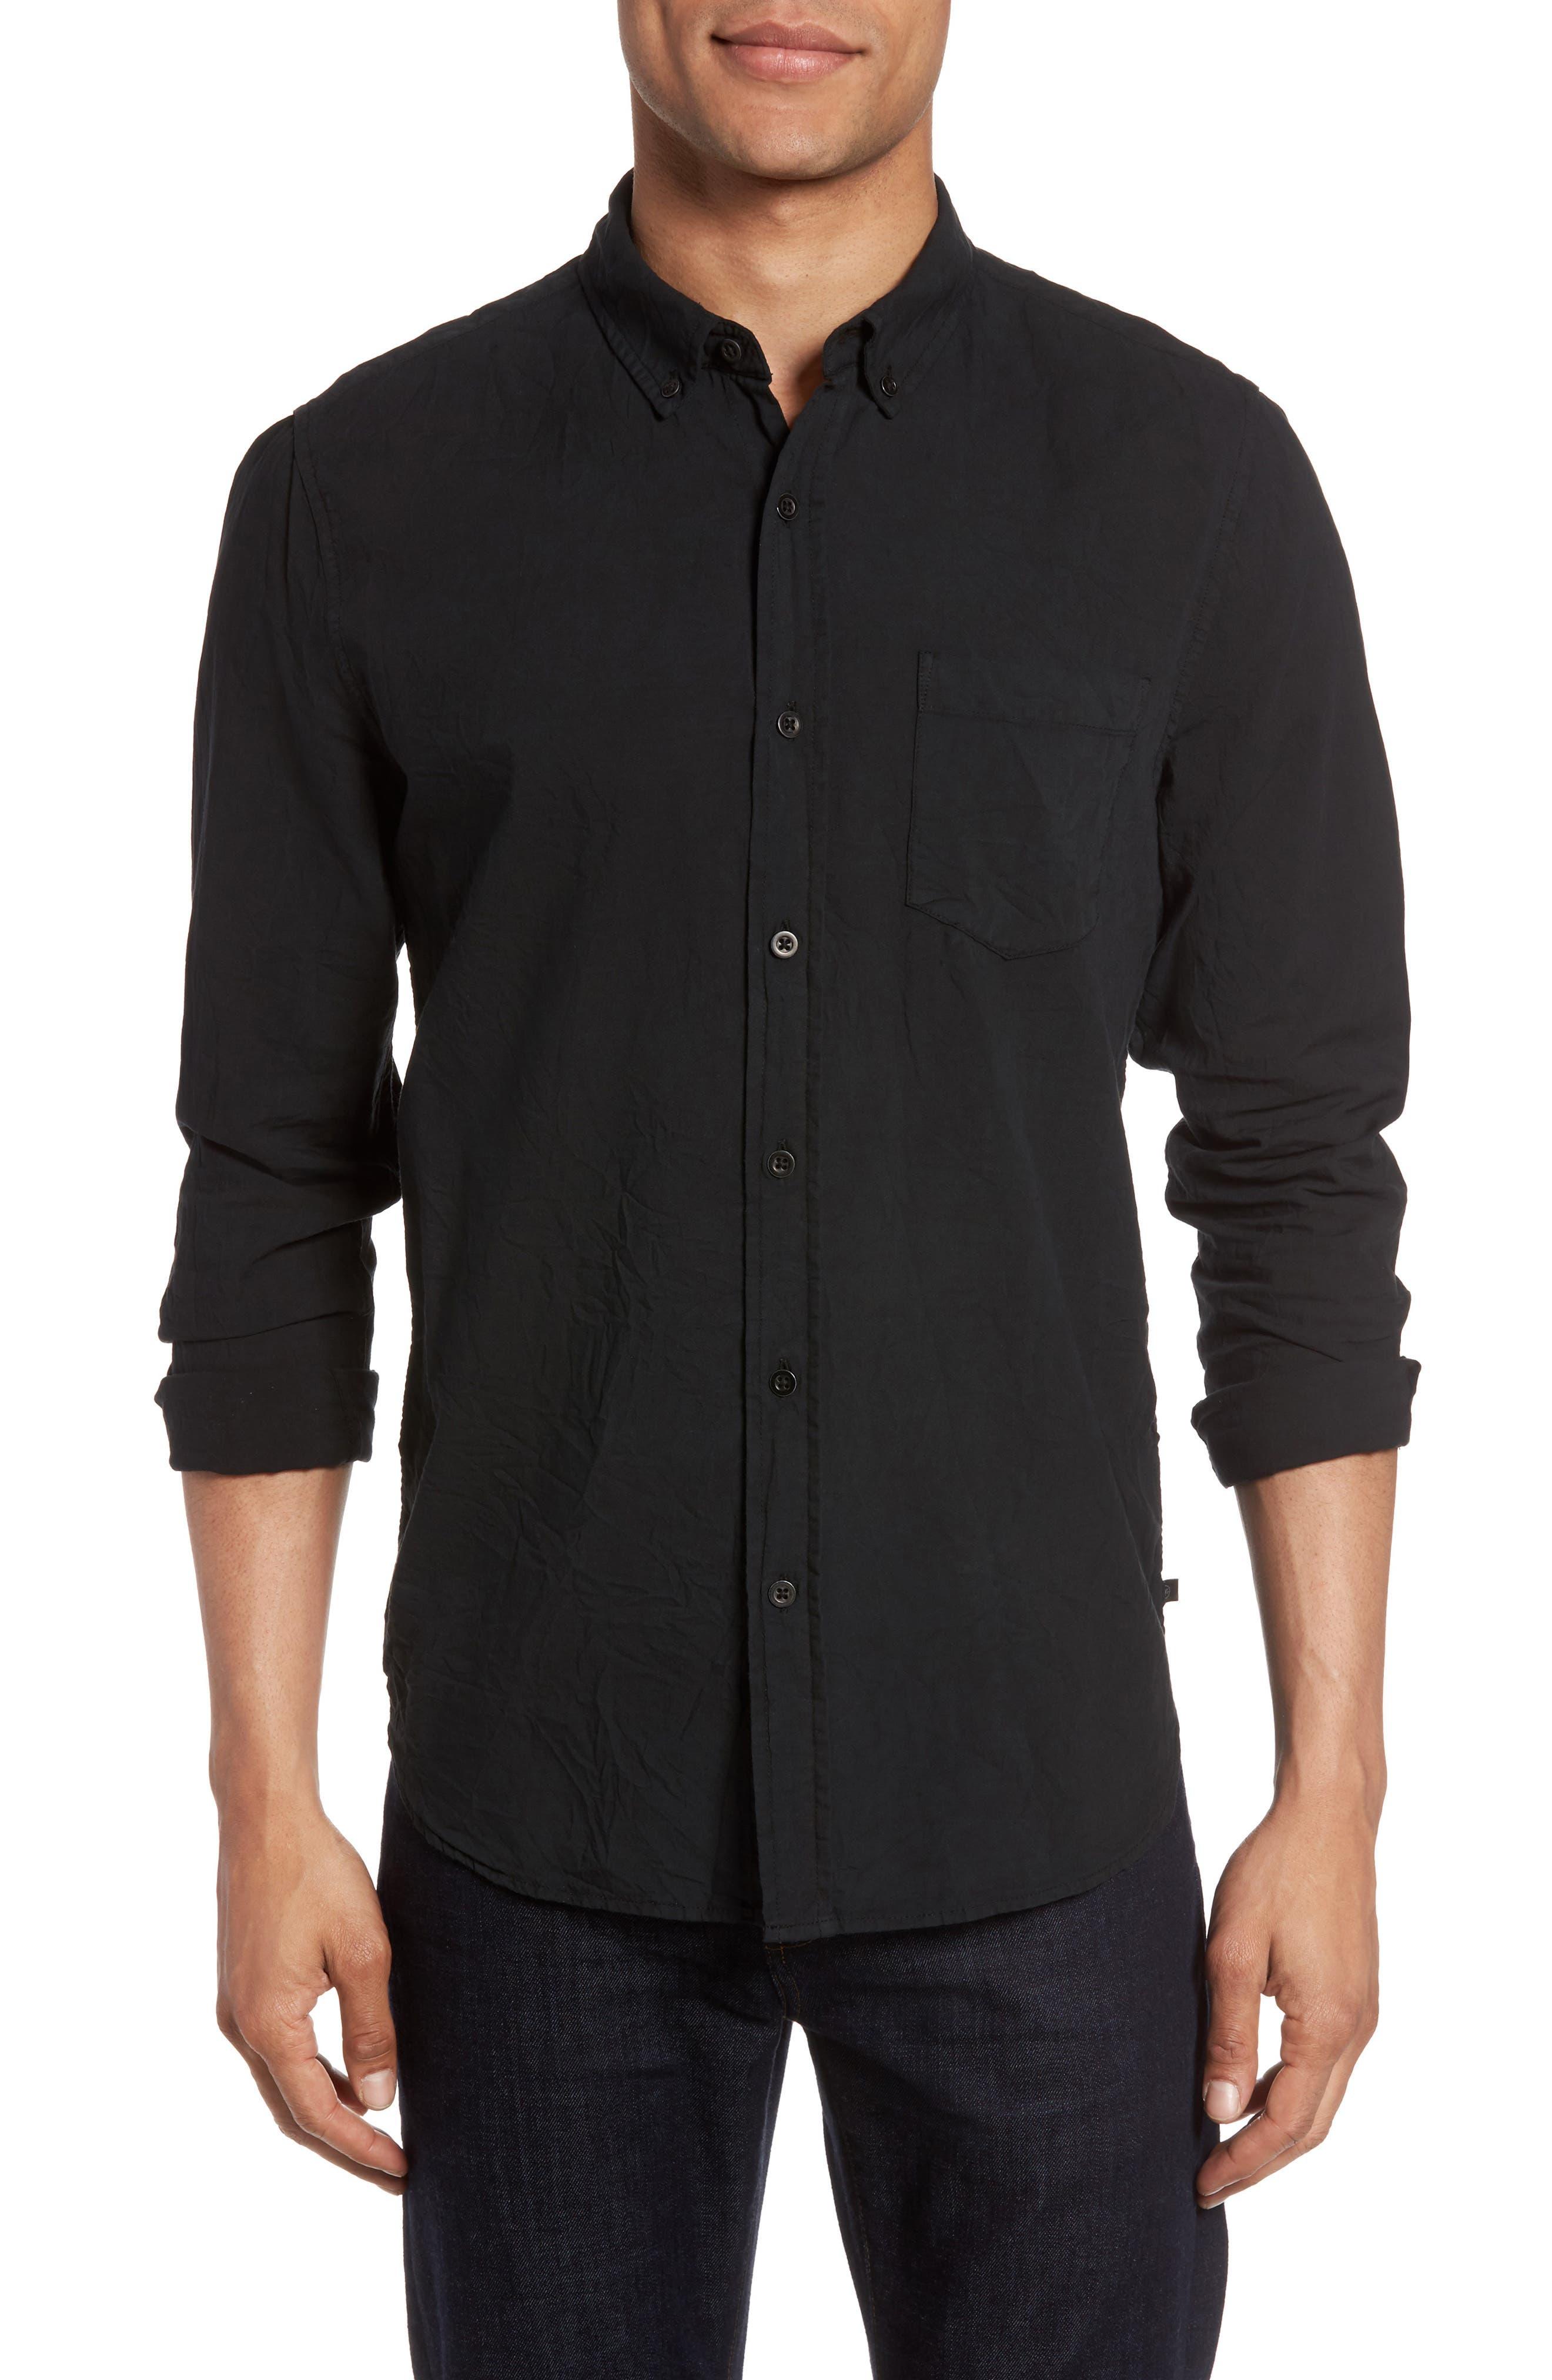 Main Image - AG Grady Slim Fit Organic Cotton Sport Shirt